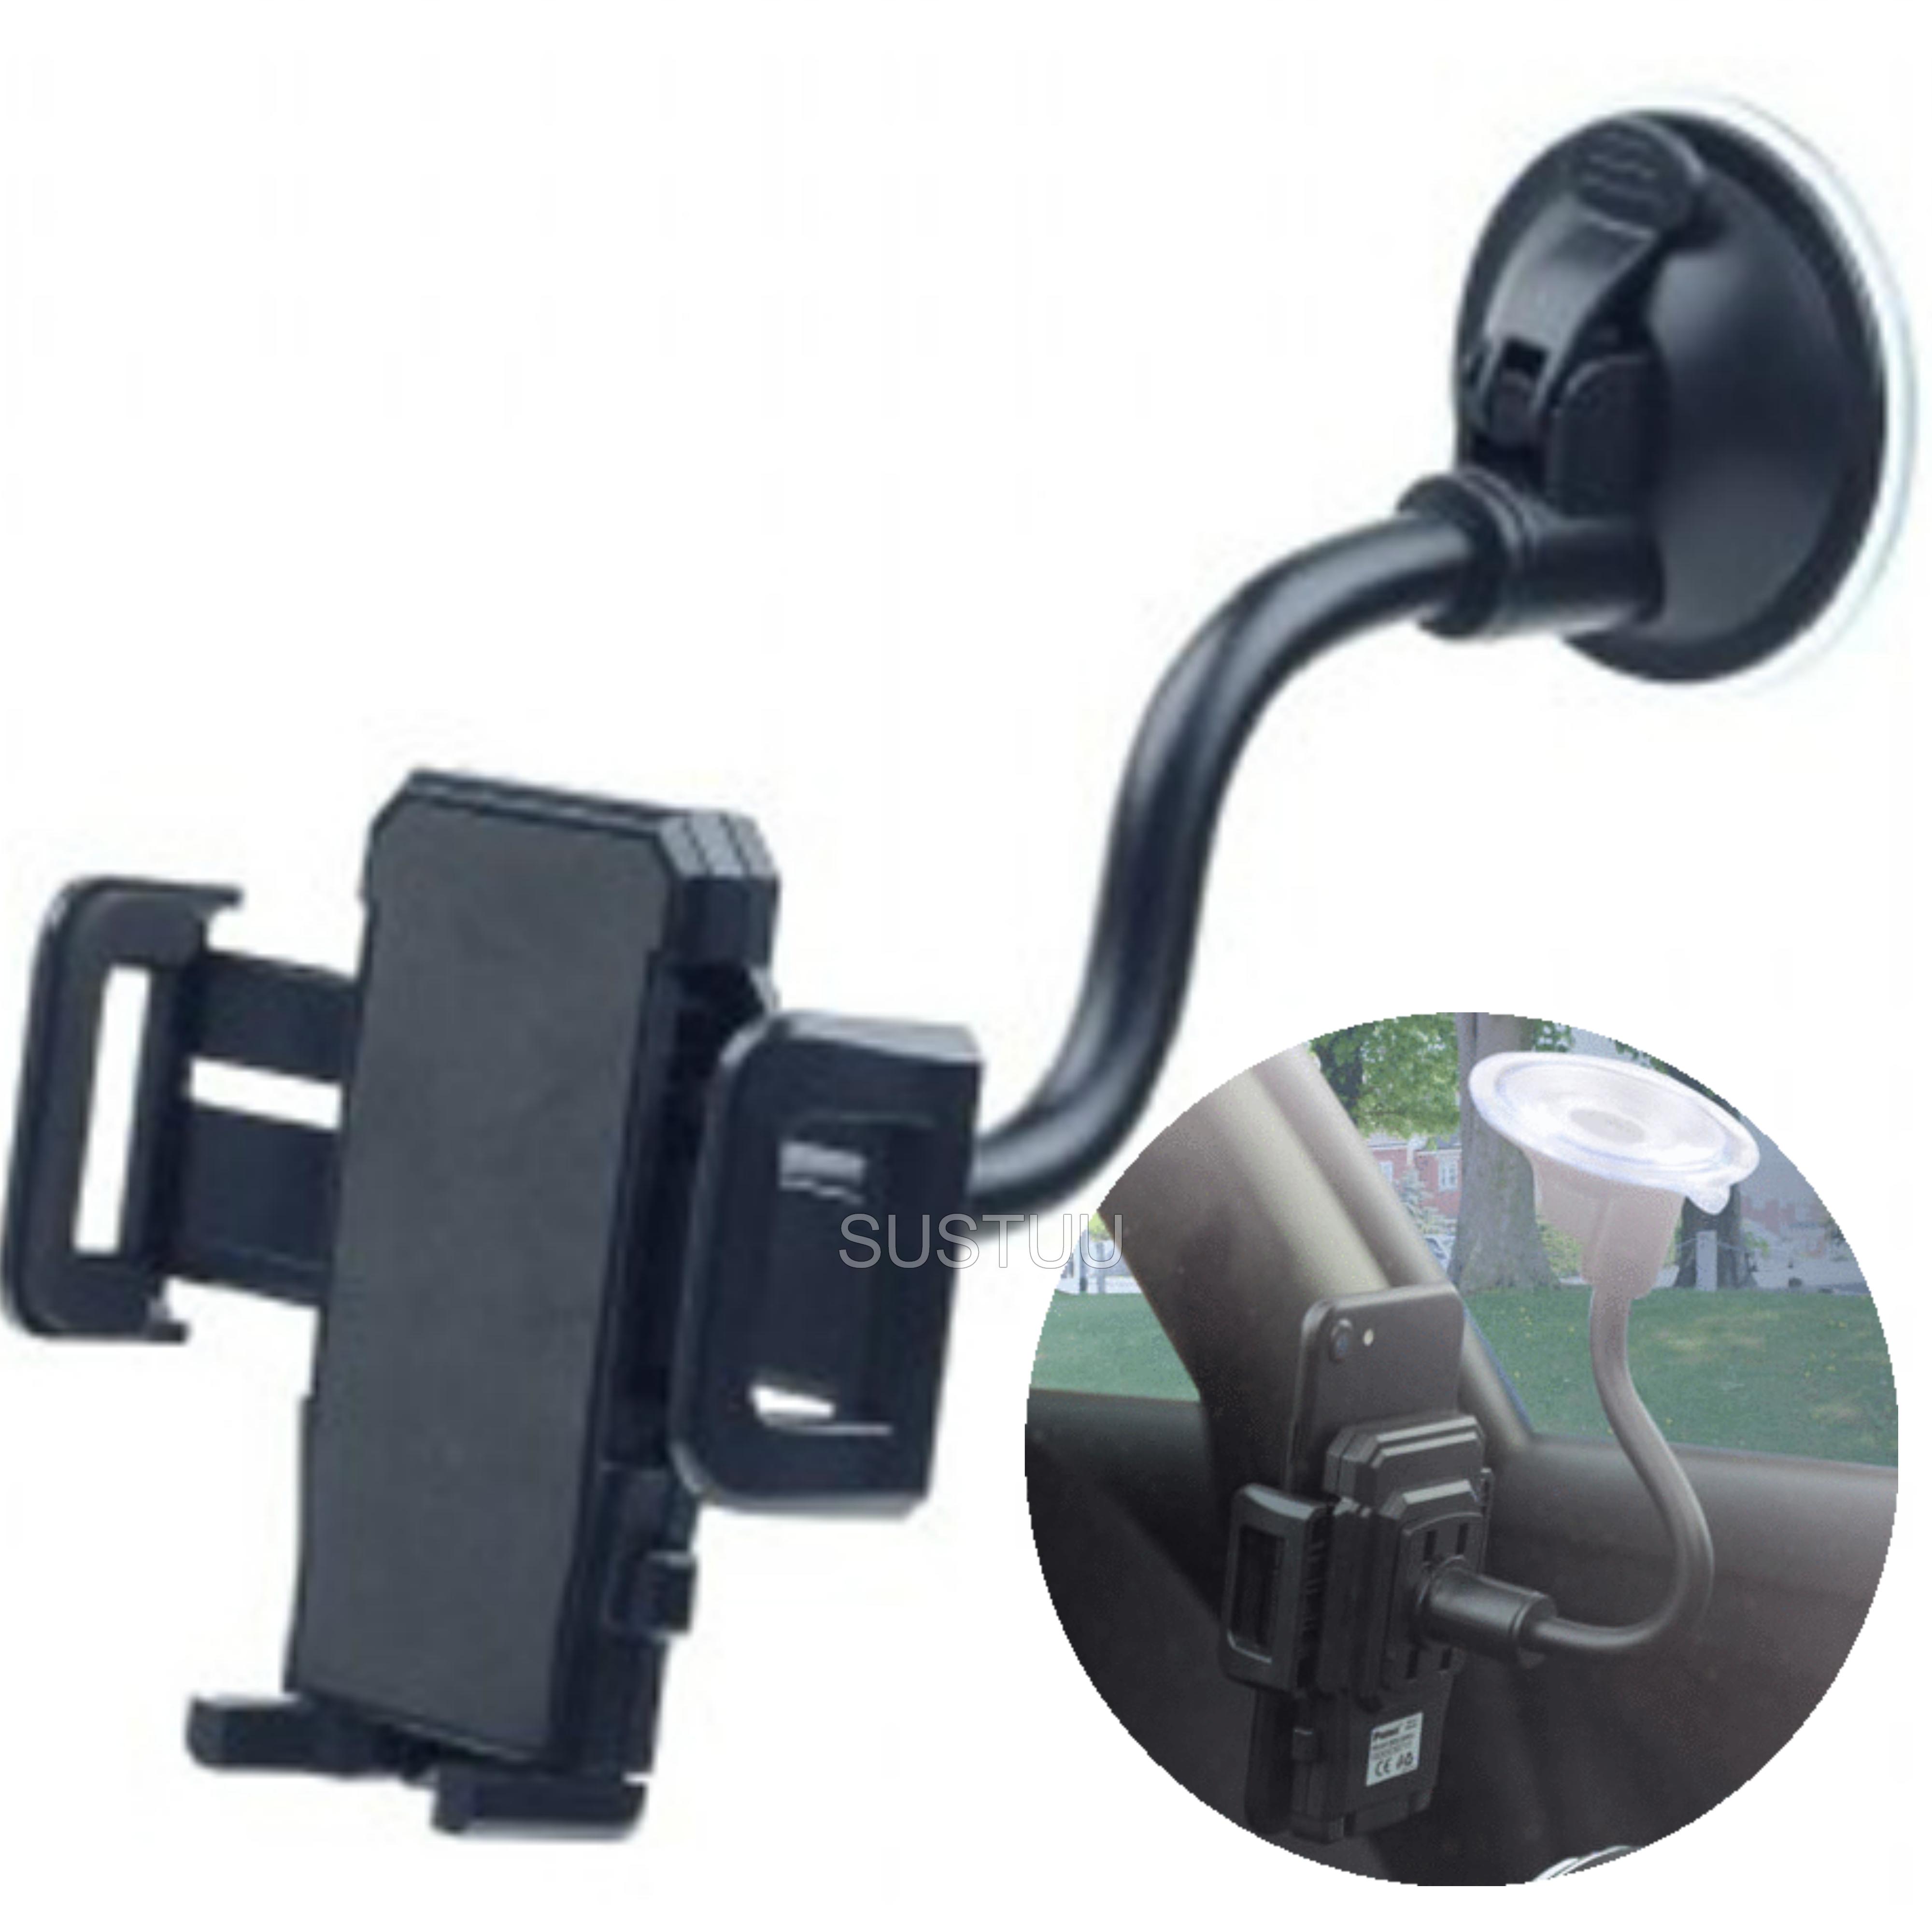 Universal In Car Windscreen Mount | Holder / Cradle | For Mobile Phone - iPod - GPS / SatNav